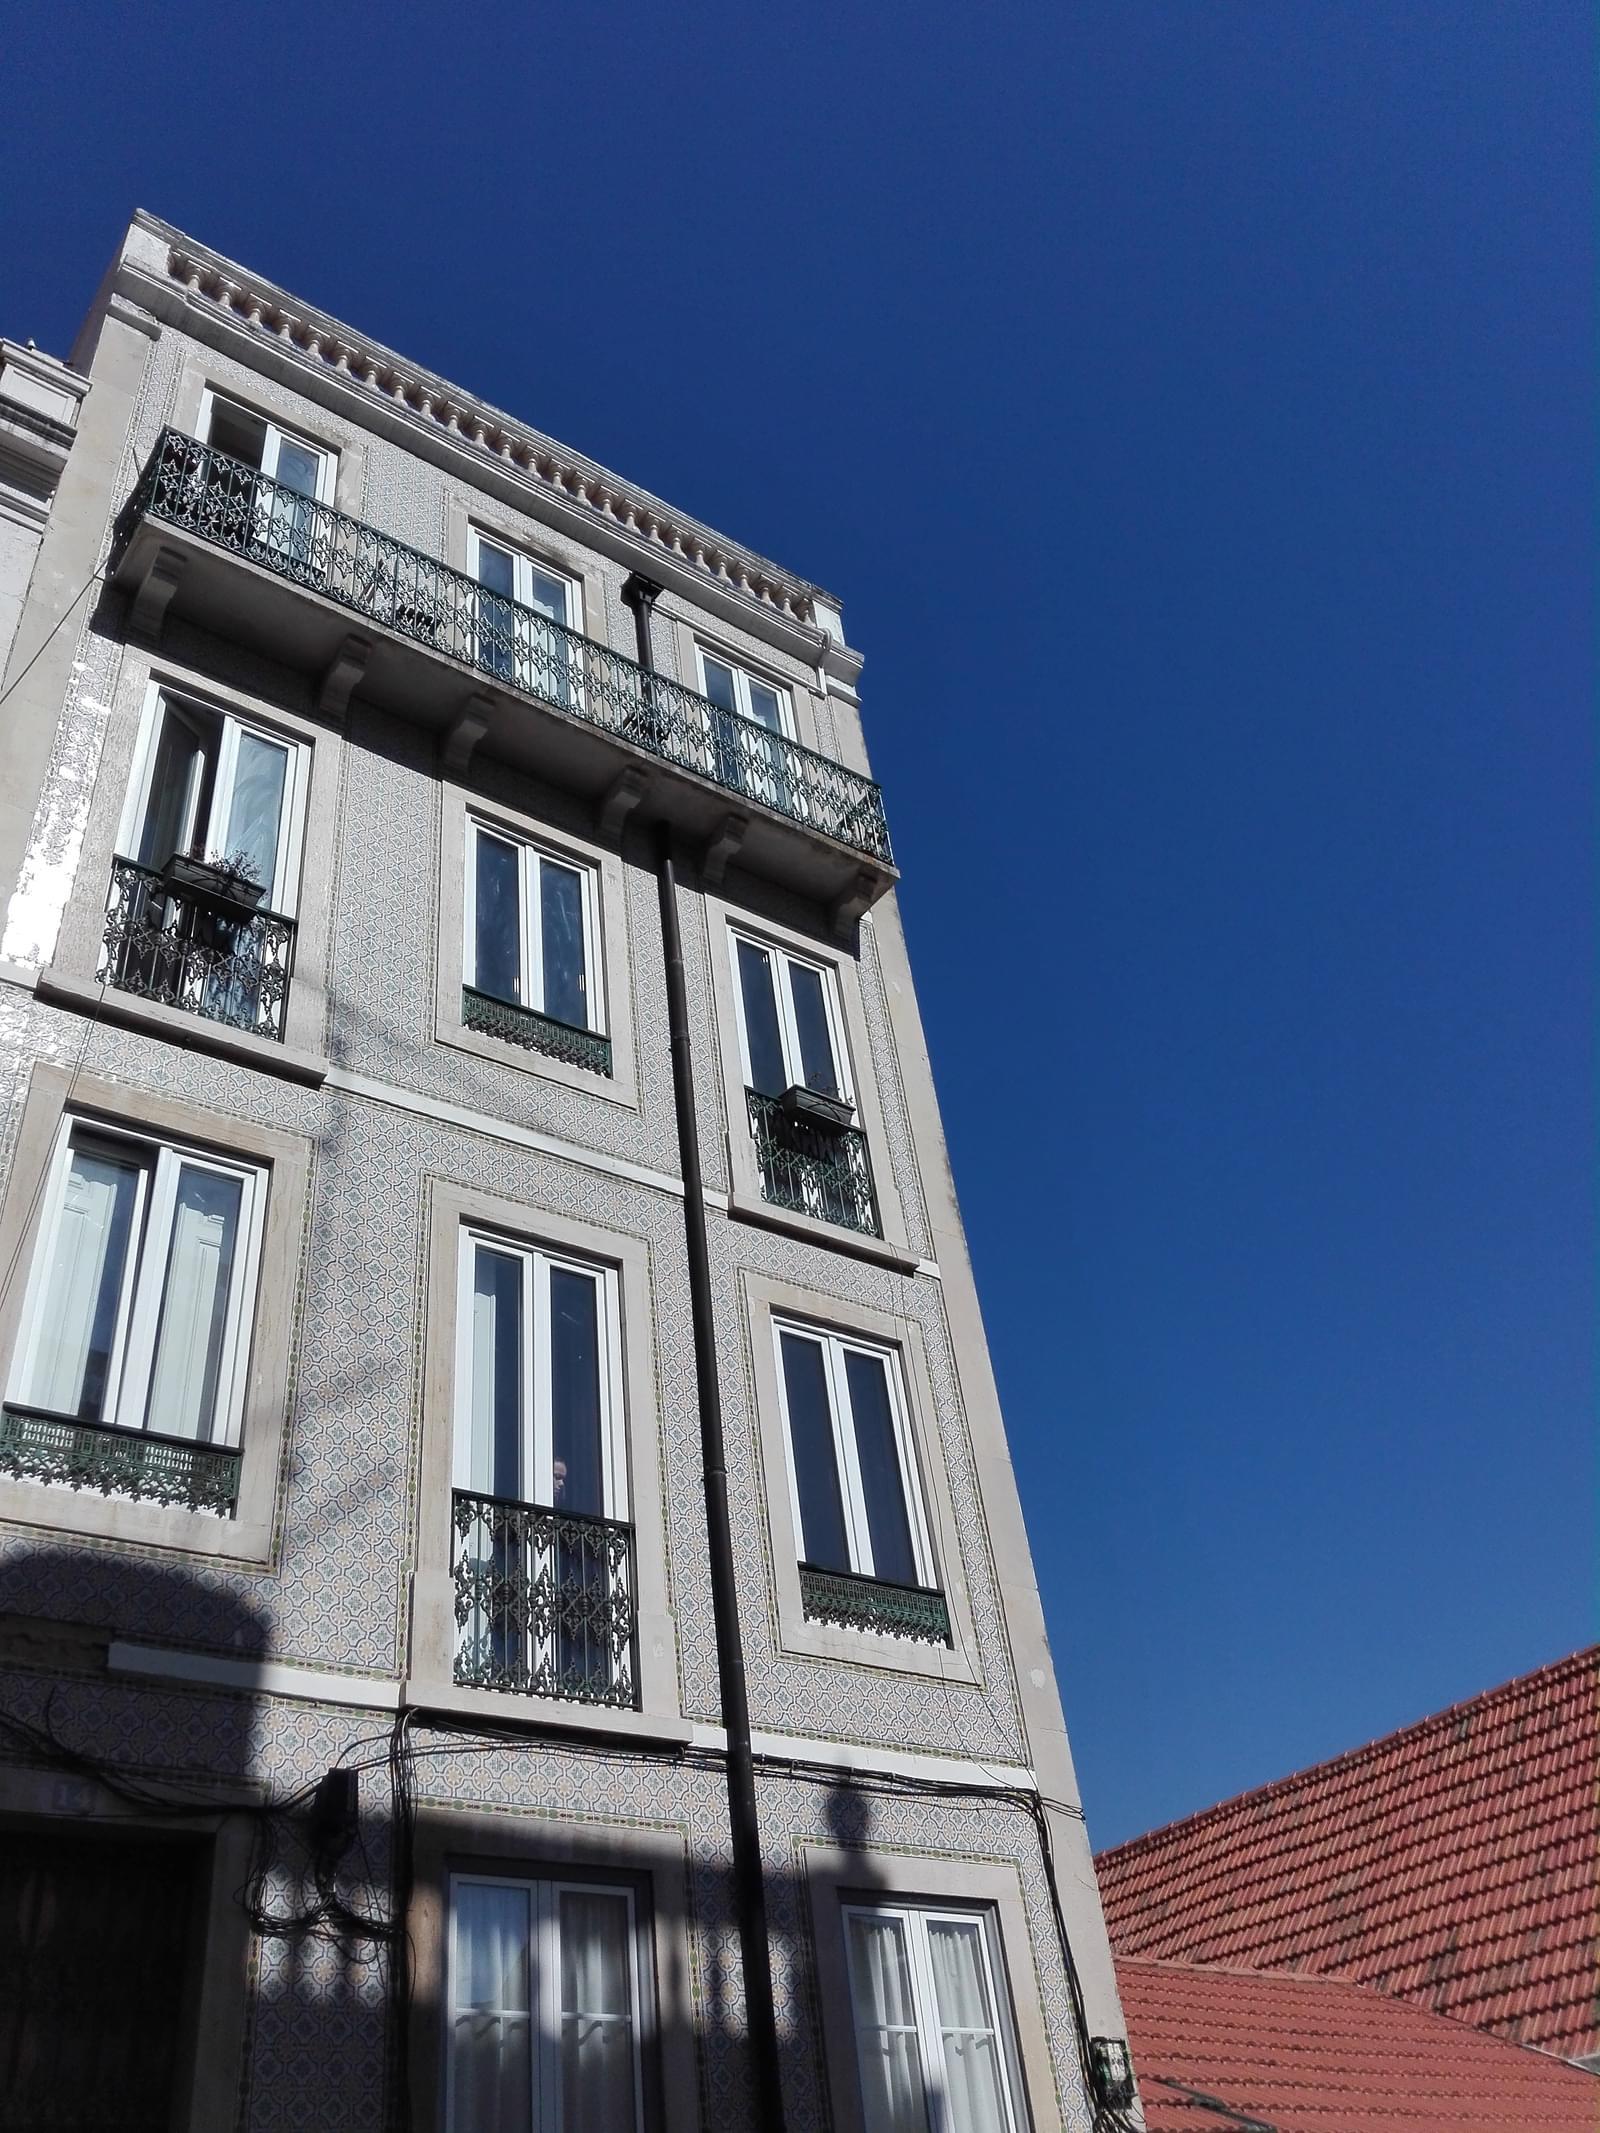 pf18269-apartamento-t1-lisboa-18f7017e-7c16-41c1-8997-be5f97ef68c4